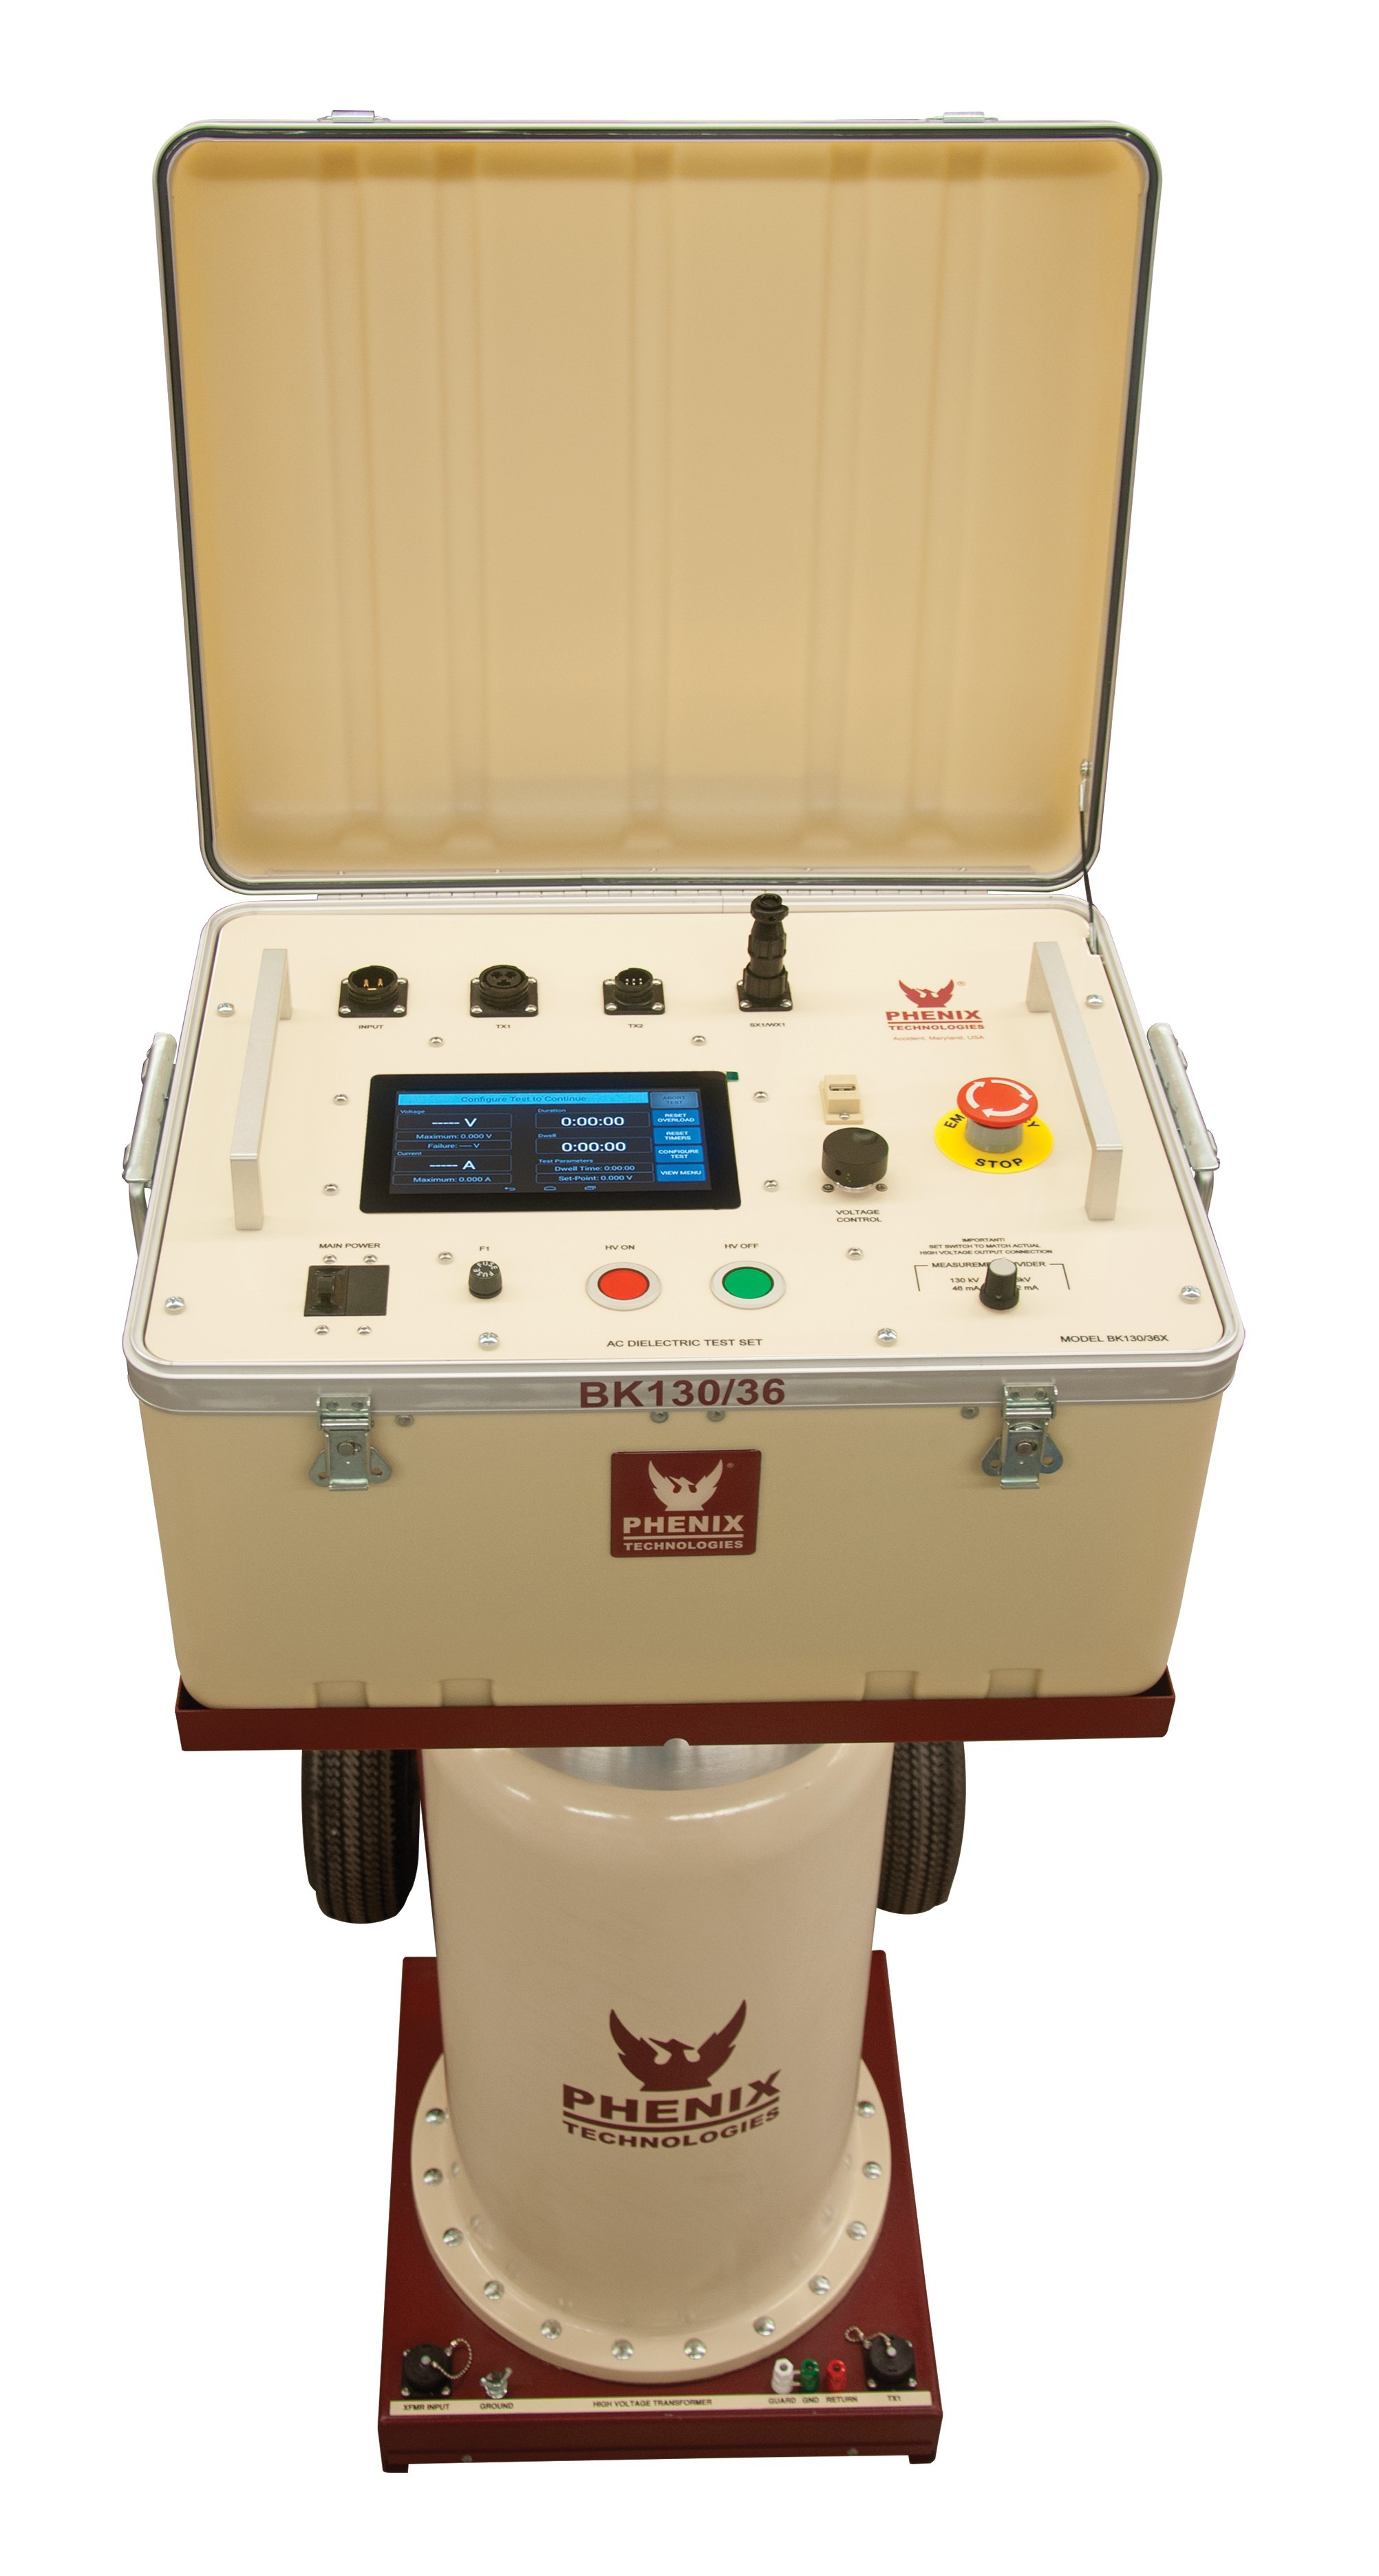 Phenix BK series 36kV to 300kV AC Hipot Test Set - Hipot Test Equipment -  T&M Products - Pro-Test Instruments Ltd